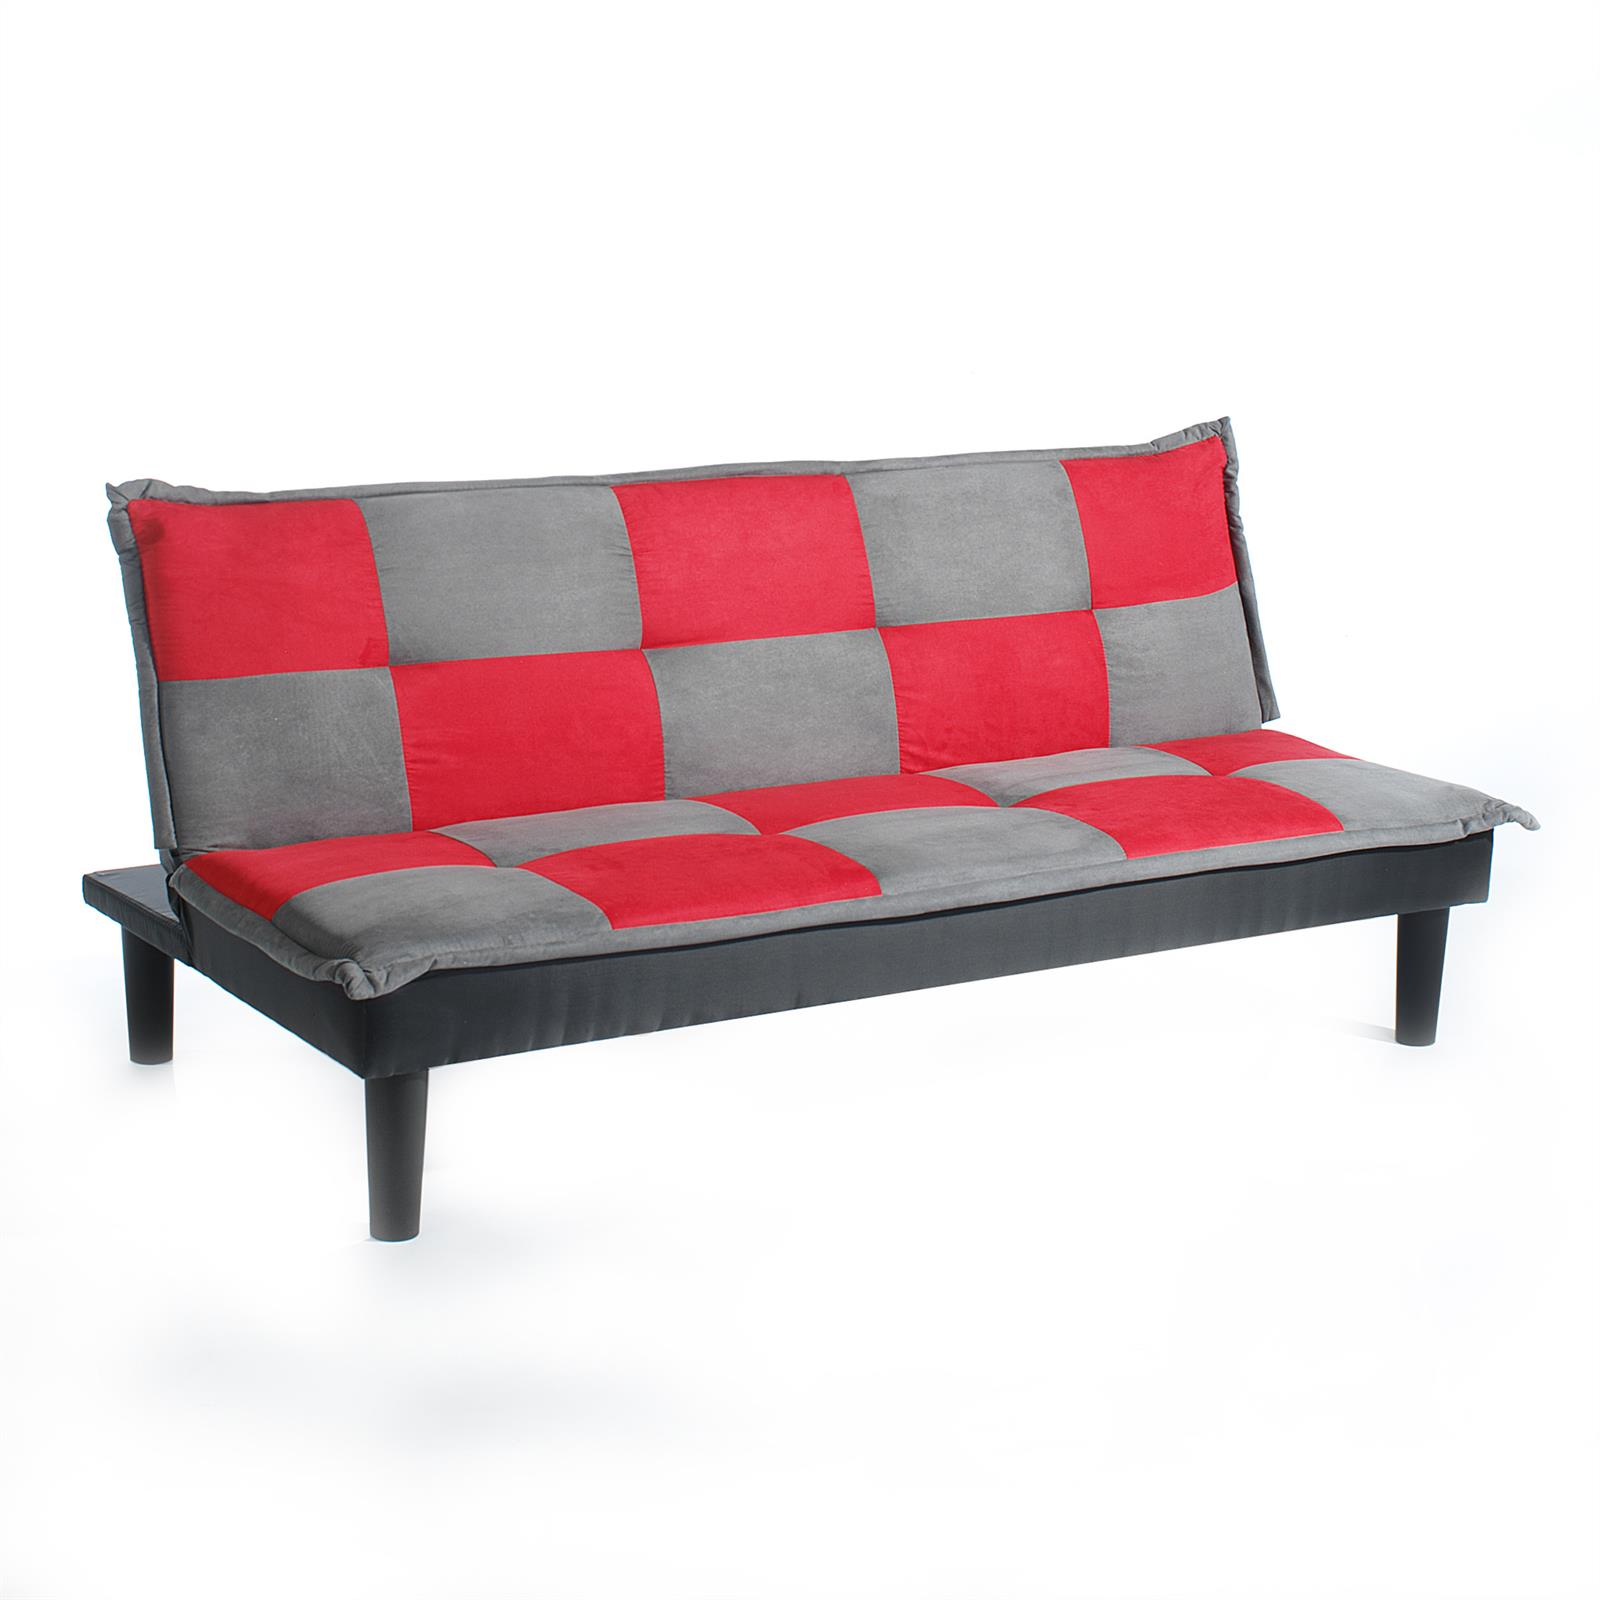 sofabett klappsofa schlafsofa schlafcouch klappcouch 3. Black Bedroom Furniture Sets. Home Design Ideas